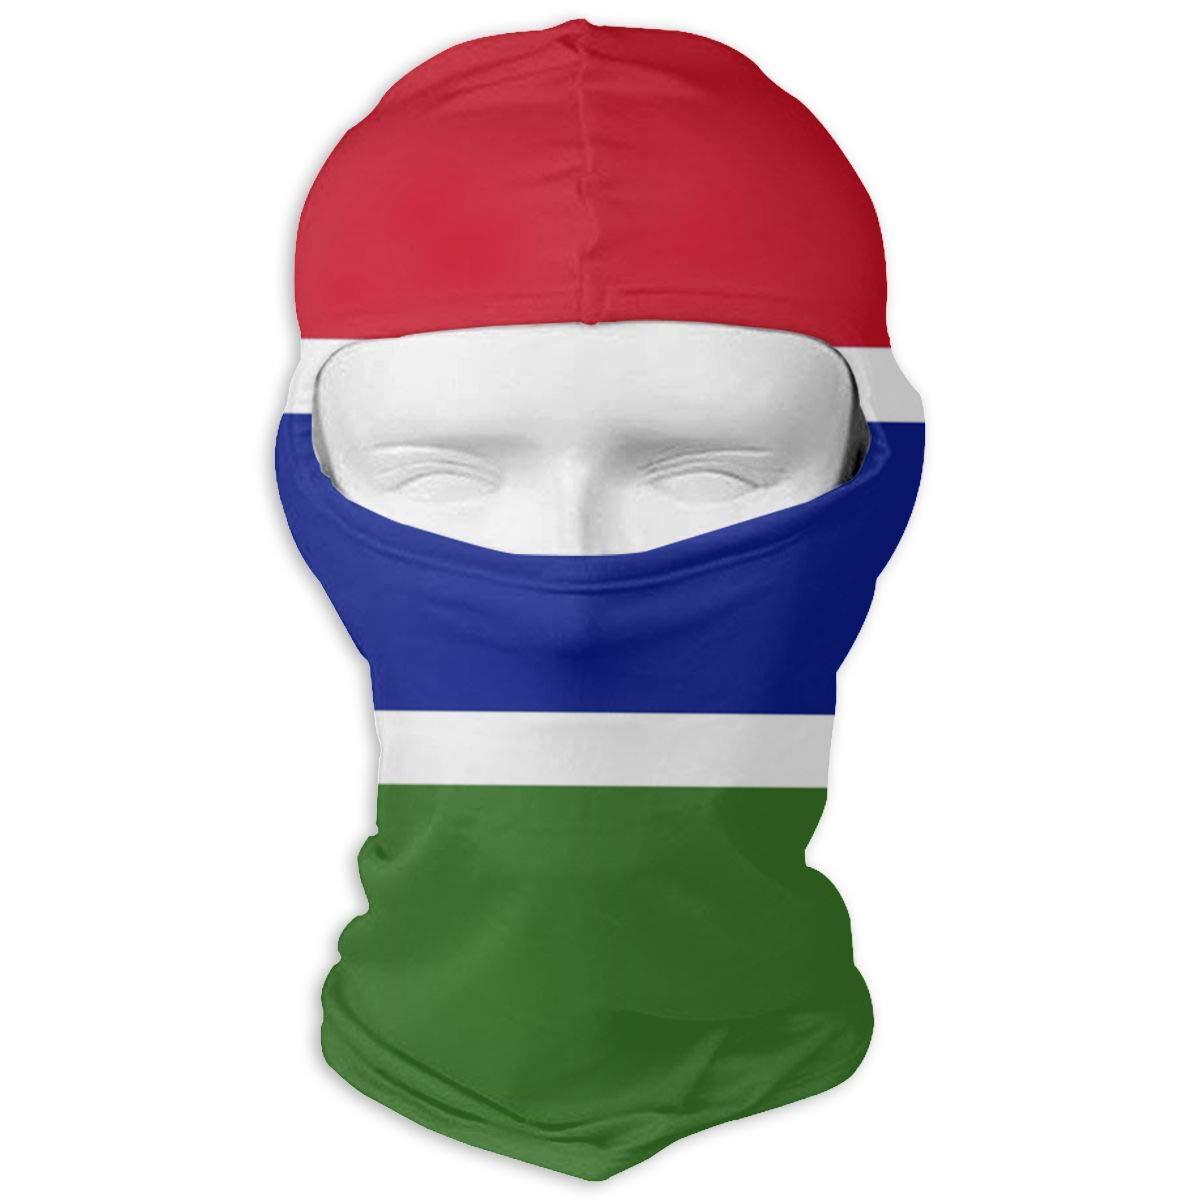 Wind-Resistant Face Mask LaoJi Flag of The Gambia Winter Ski Mask Balaclava Hood